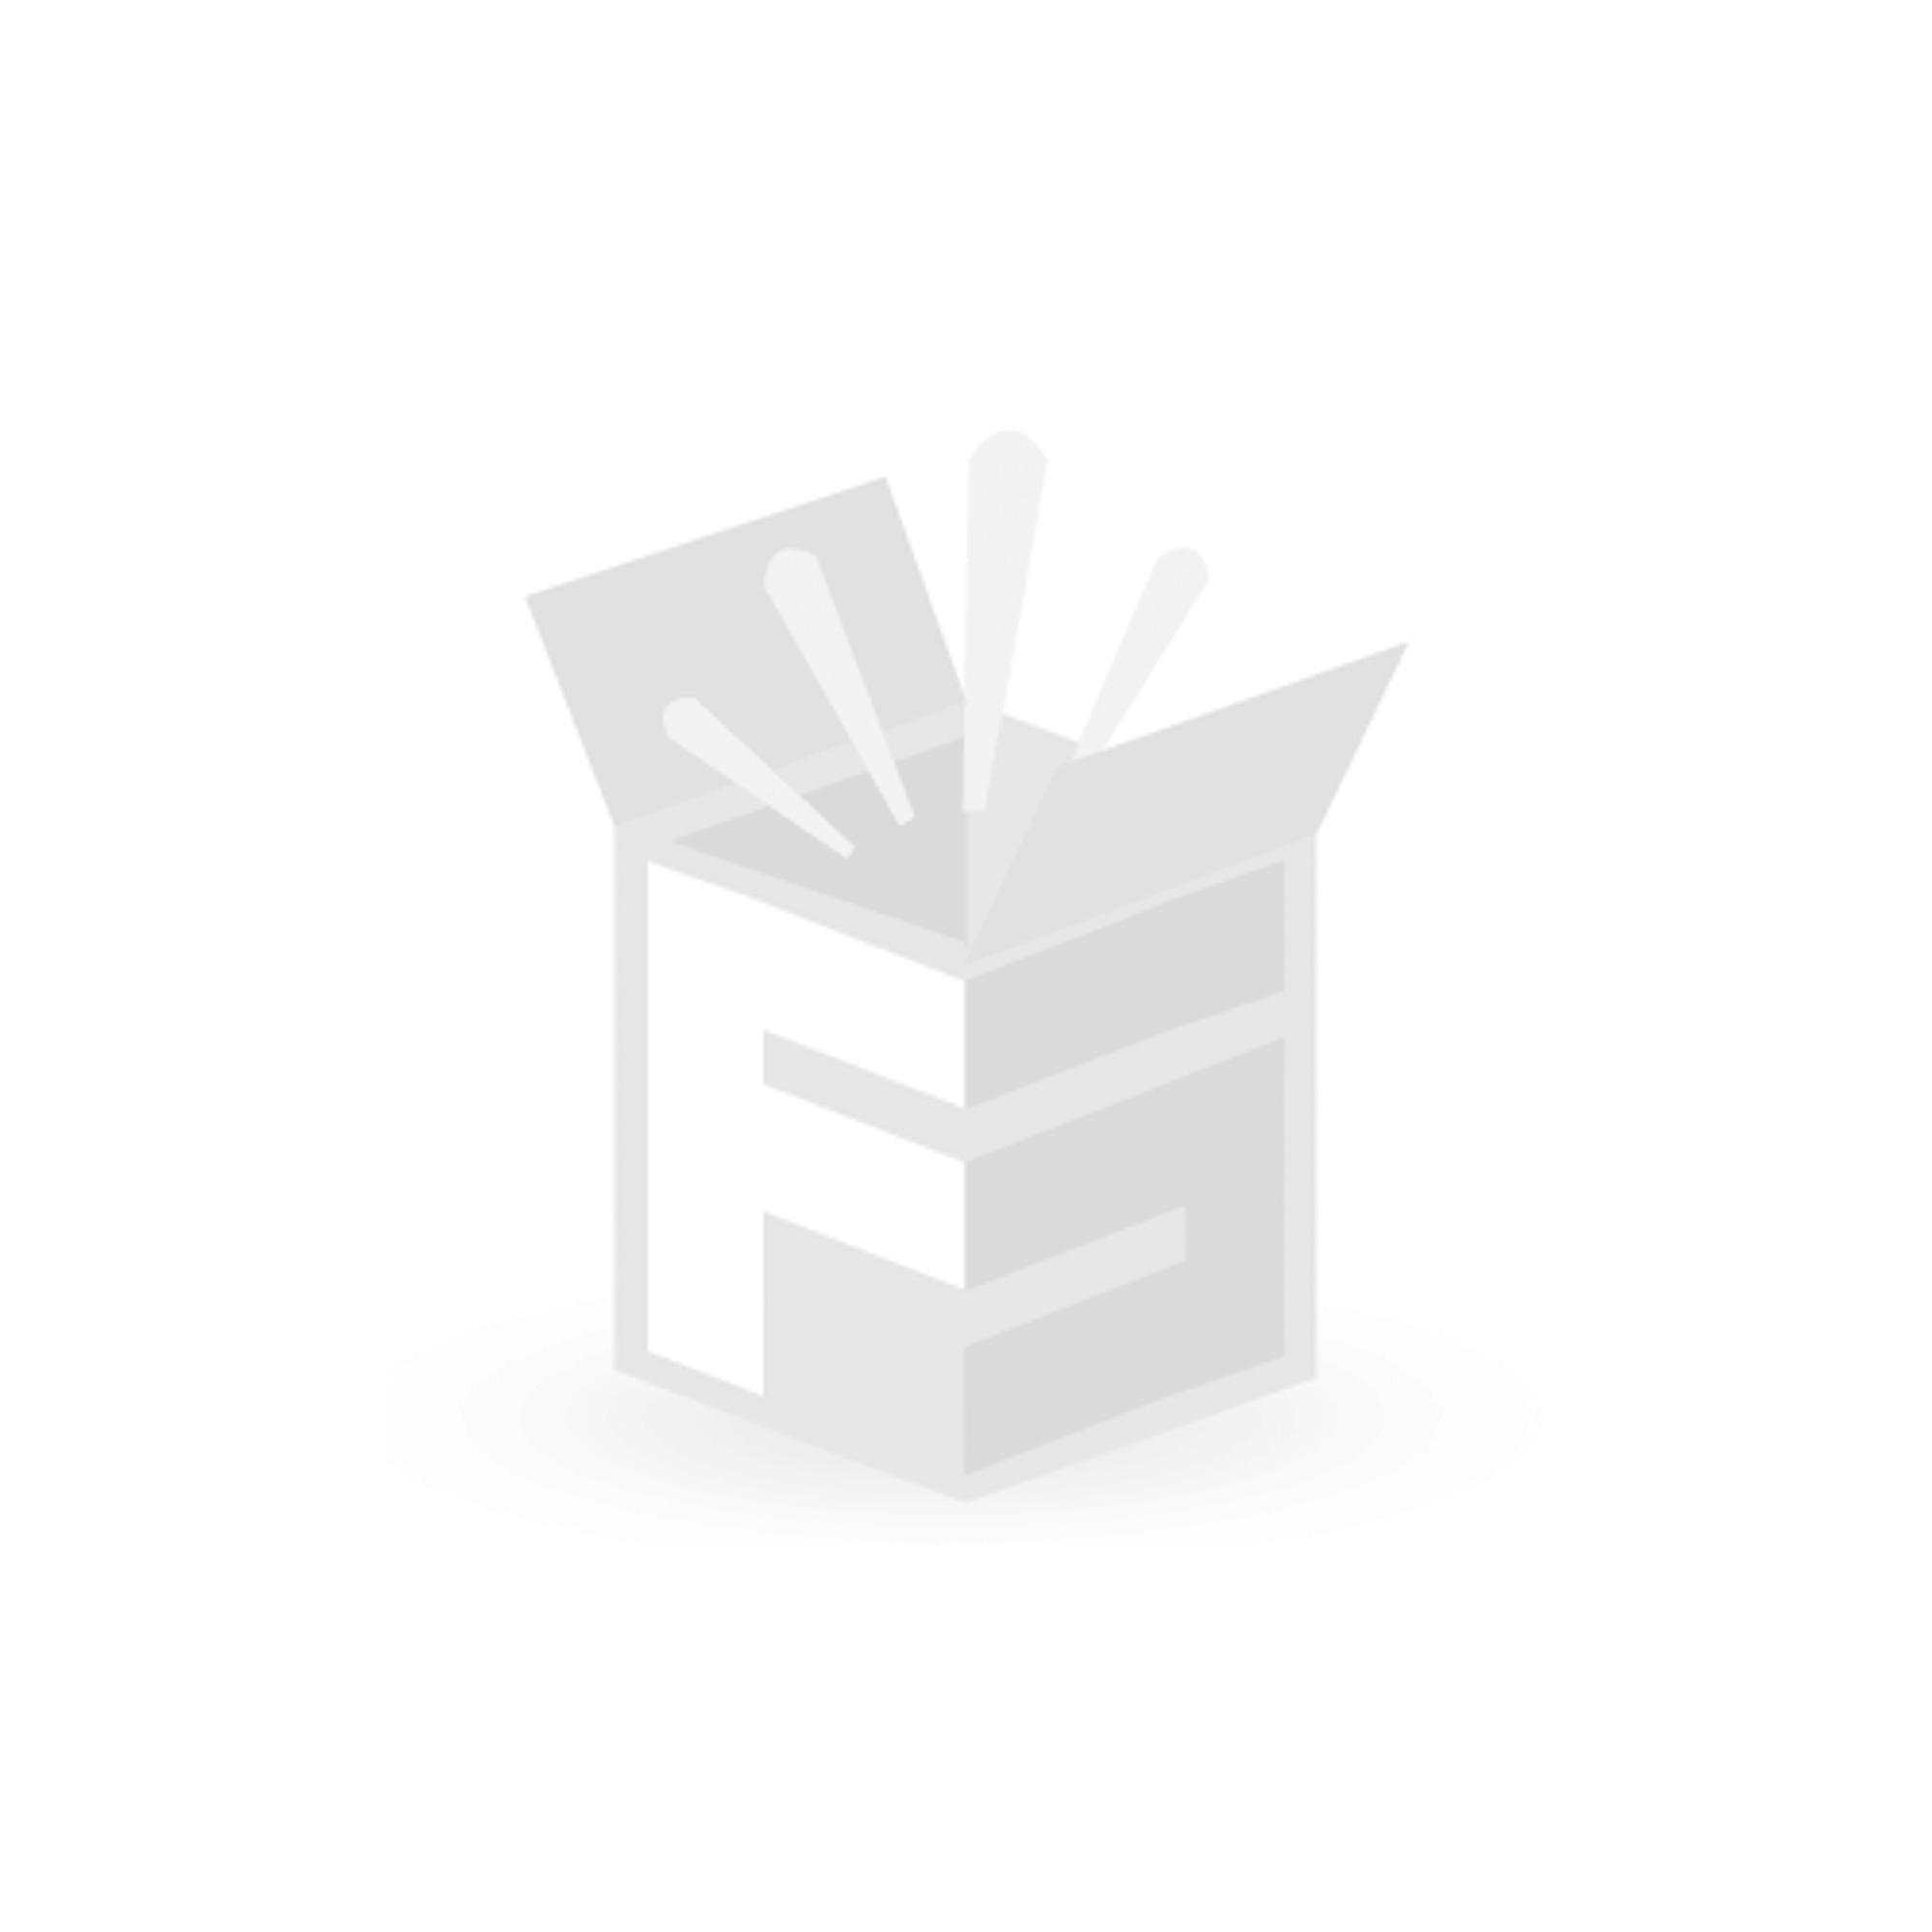 DOR Luftfederkern-Kissen 50 x 70 cm,  extra soft